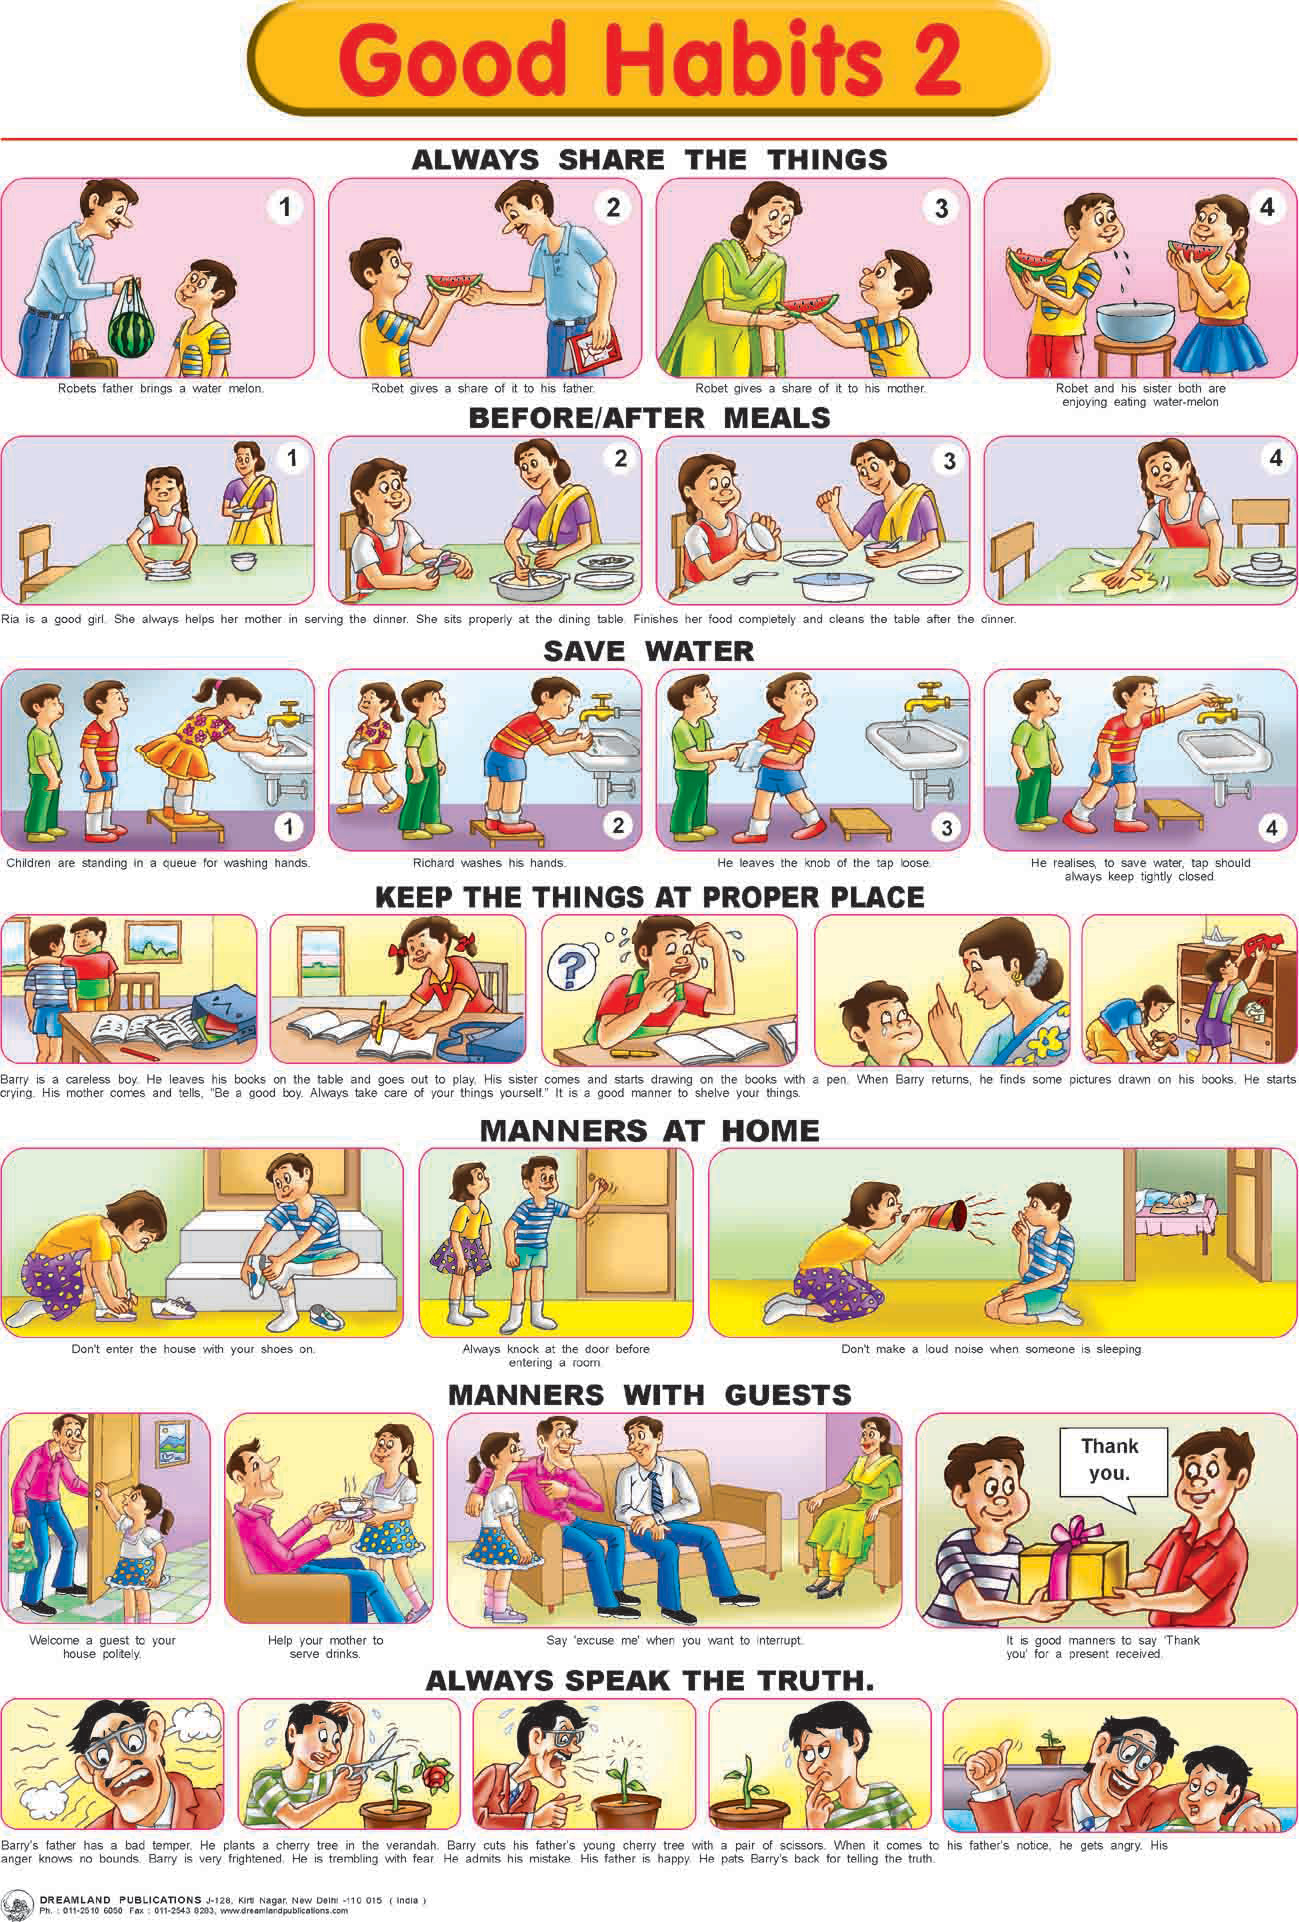 Good Health List Of Good Health Habits